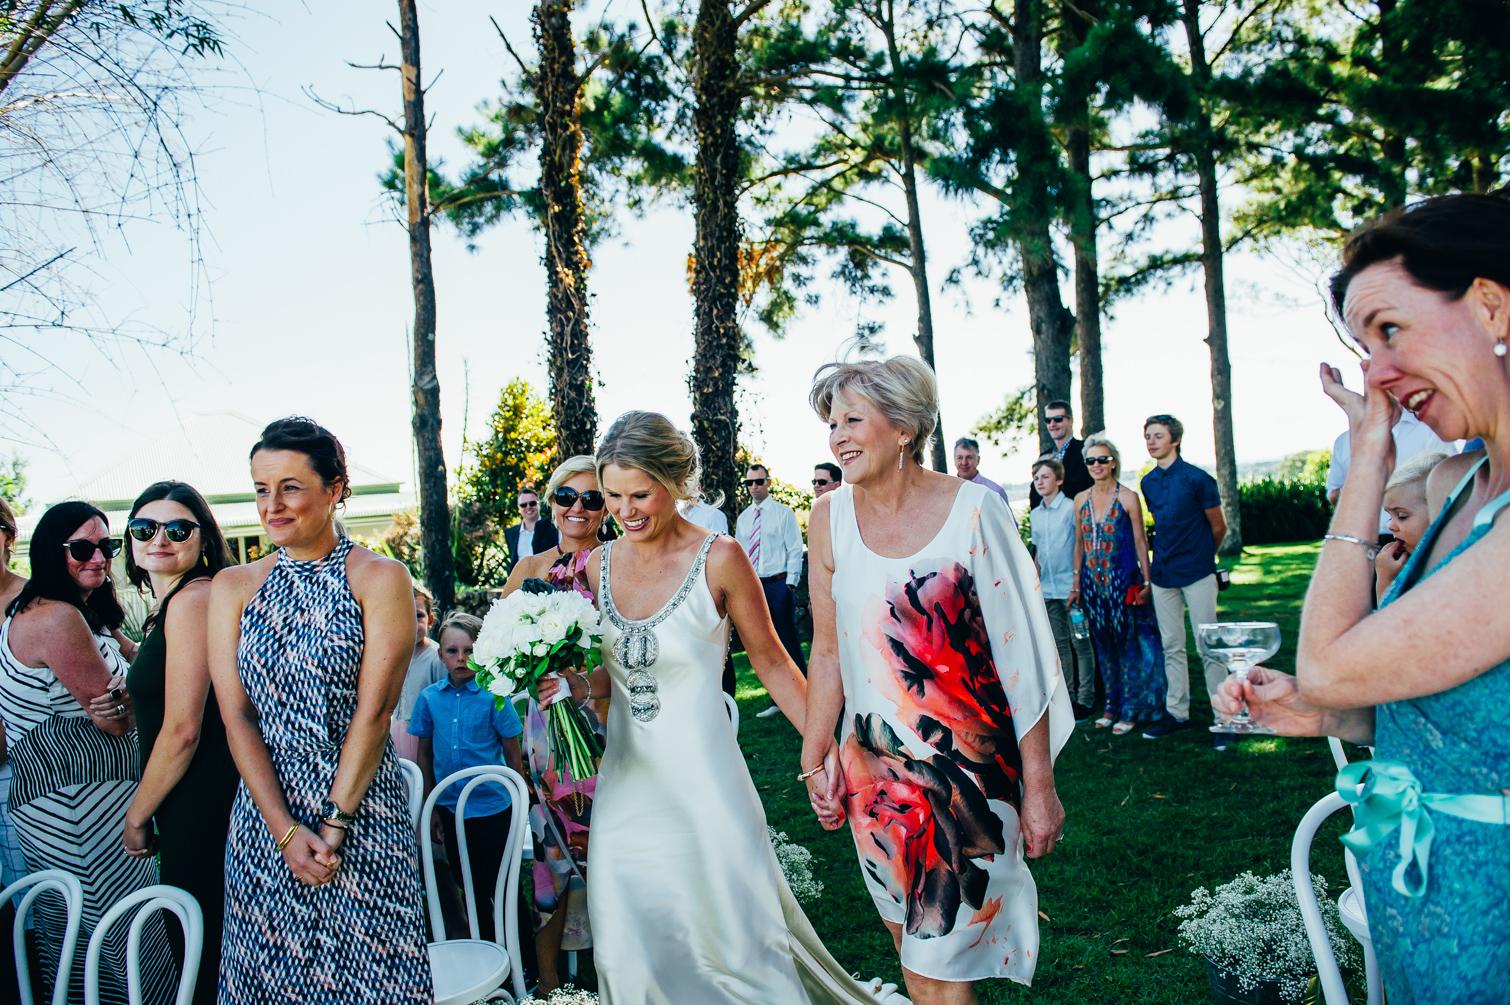 Byron_View_Wedding_Venue-8.jpg